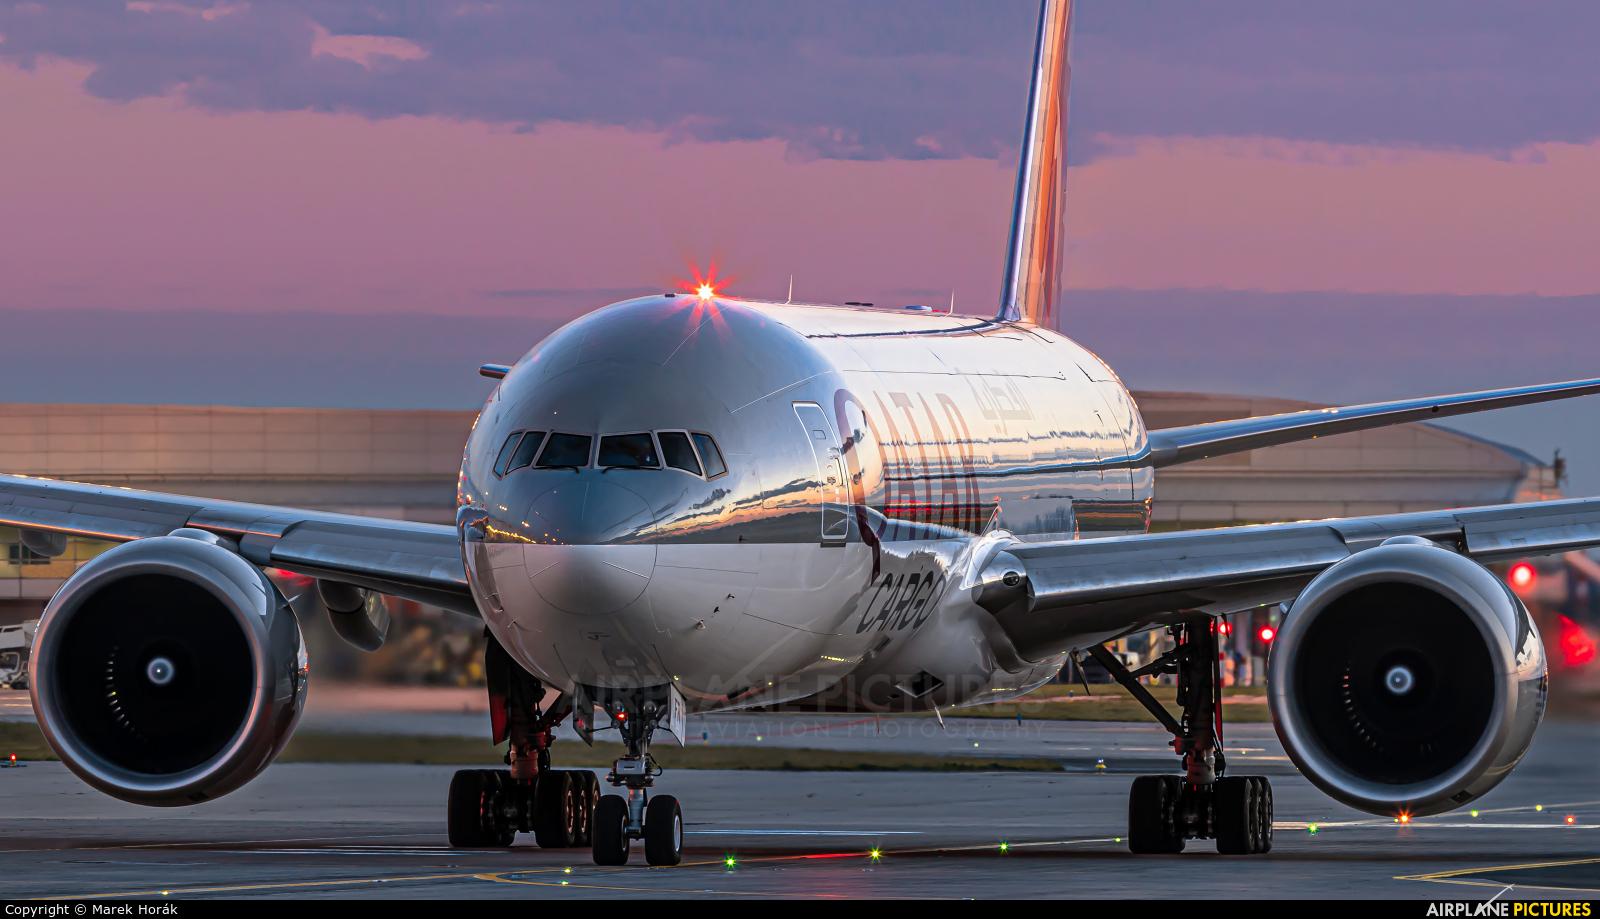 Qatar Airways Cargo A7-BFR aircraft at Prague - Václav Havel